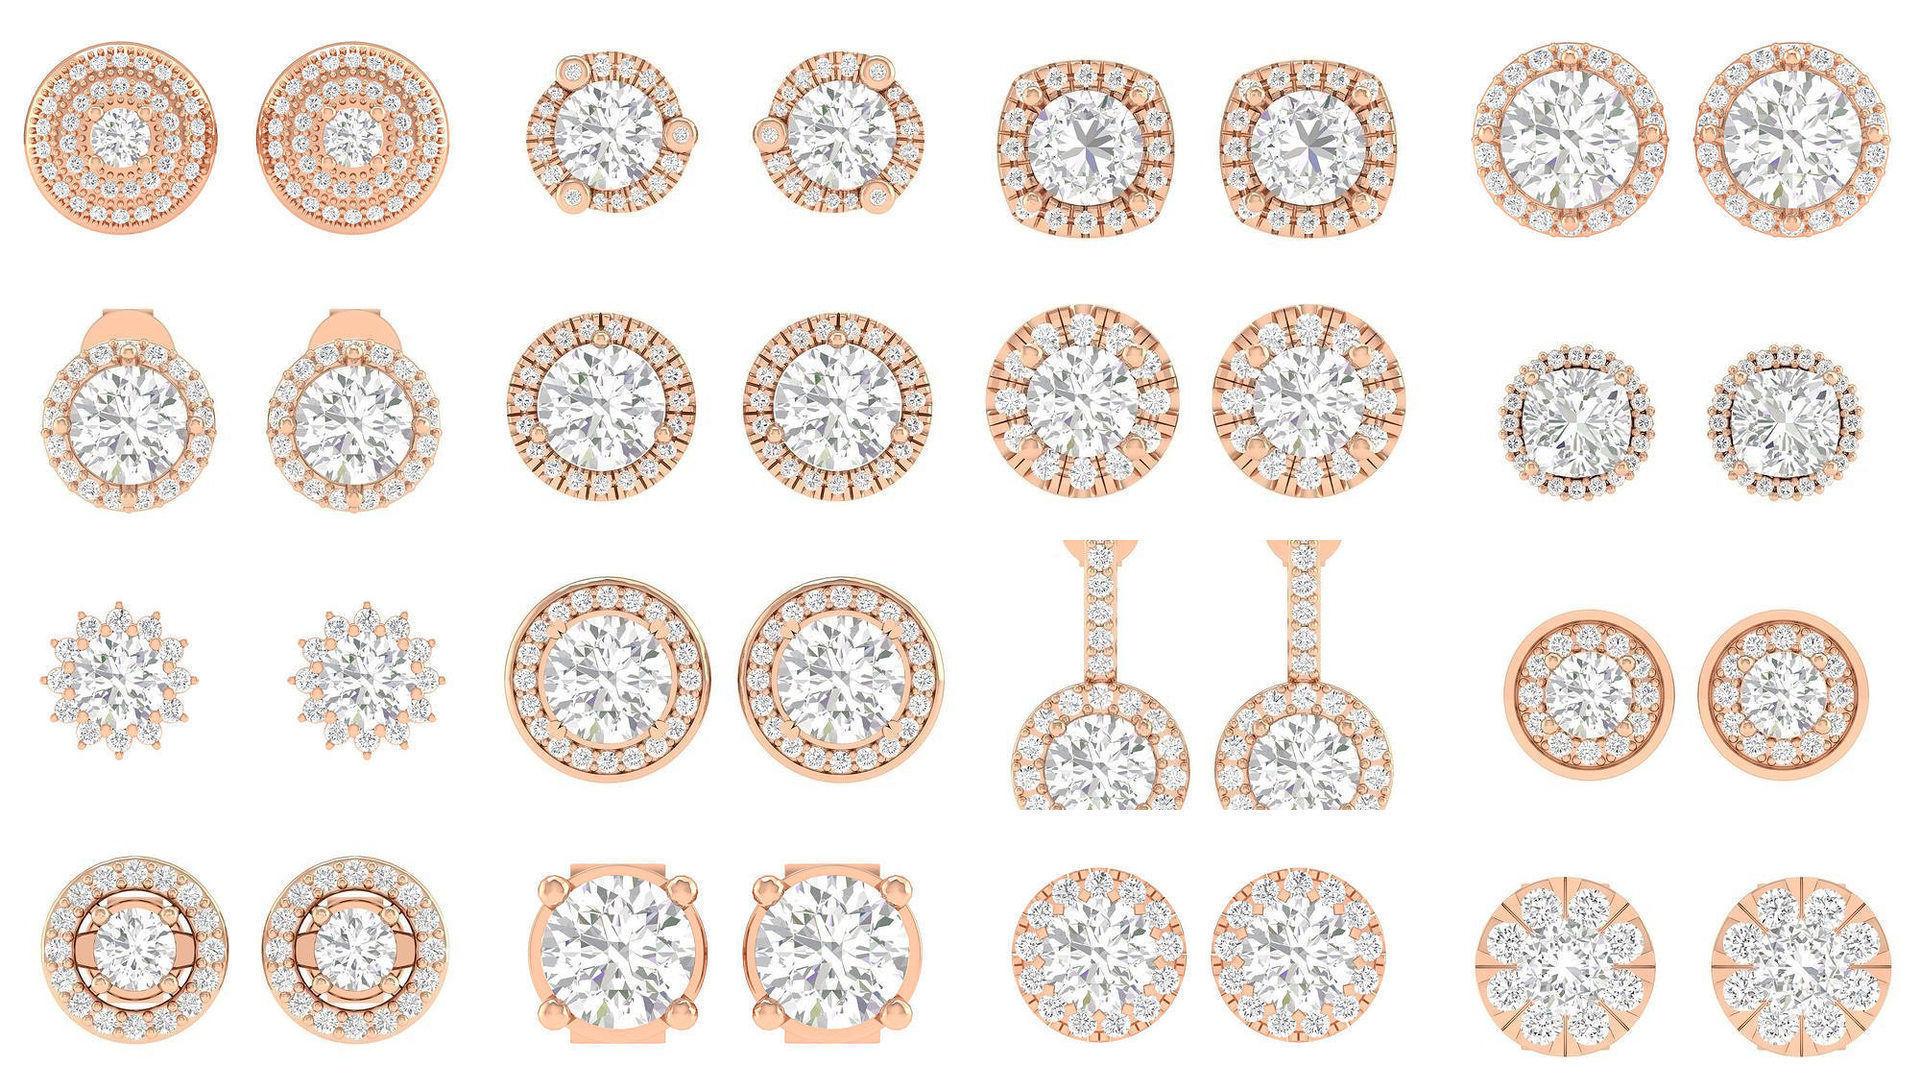 88 Women Solitaire Earrings 3dm stl render detail